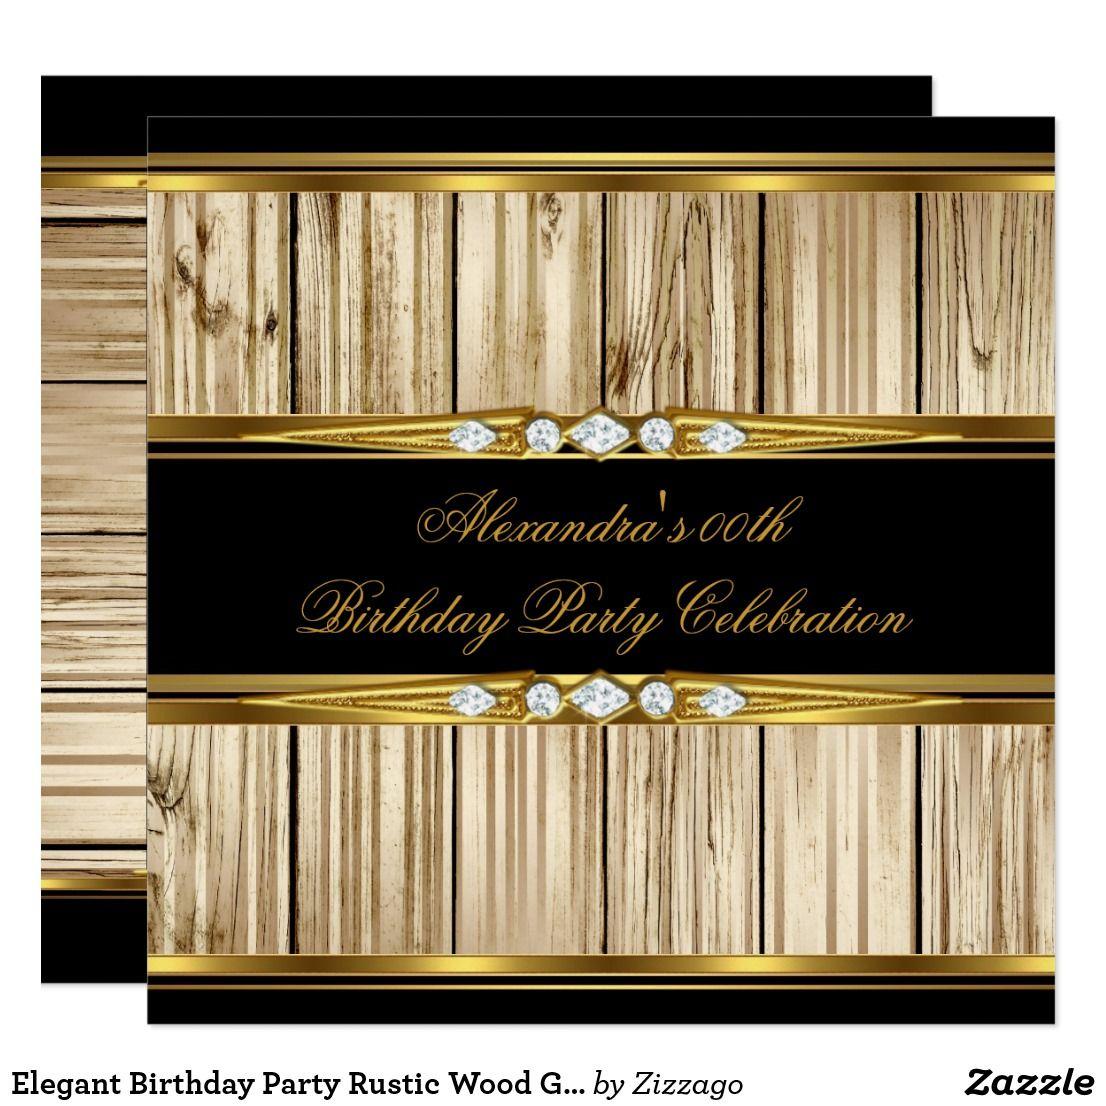 Elegant Birthday Party Rustic Wood Gold Black Invitation   Zazzle.com    Elegant birthday party, Birthday parties, Rustic wood